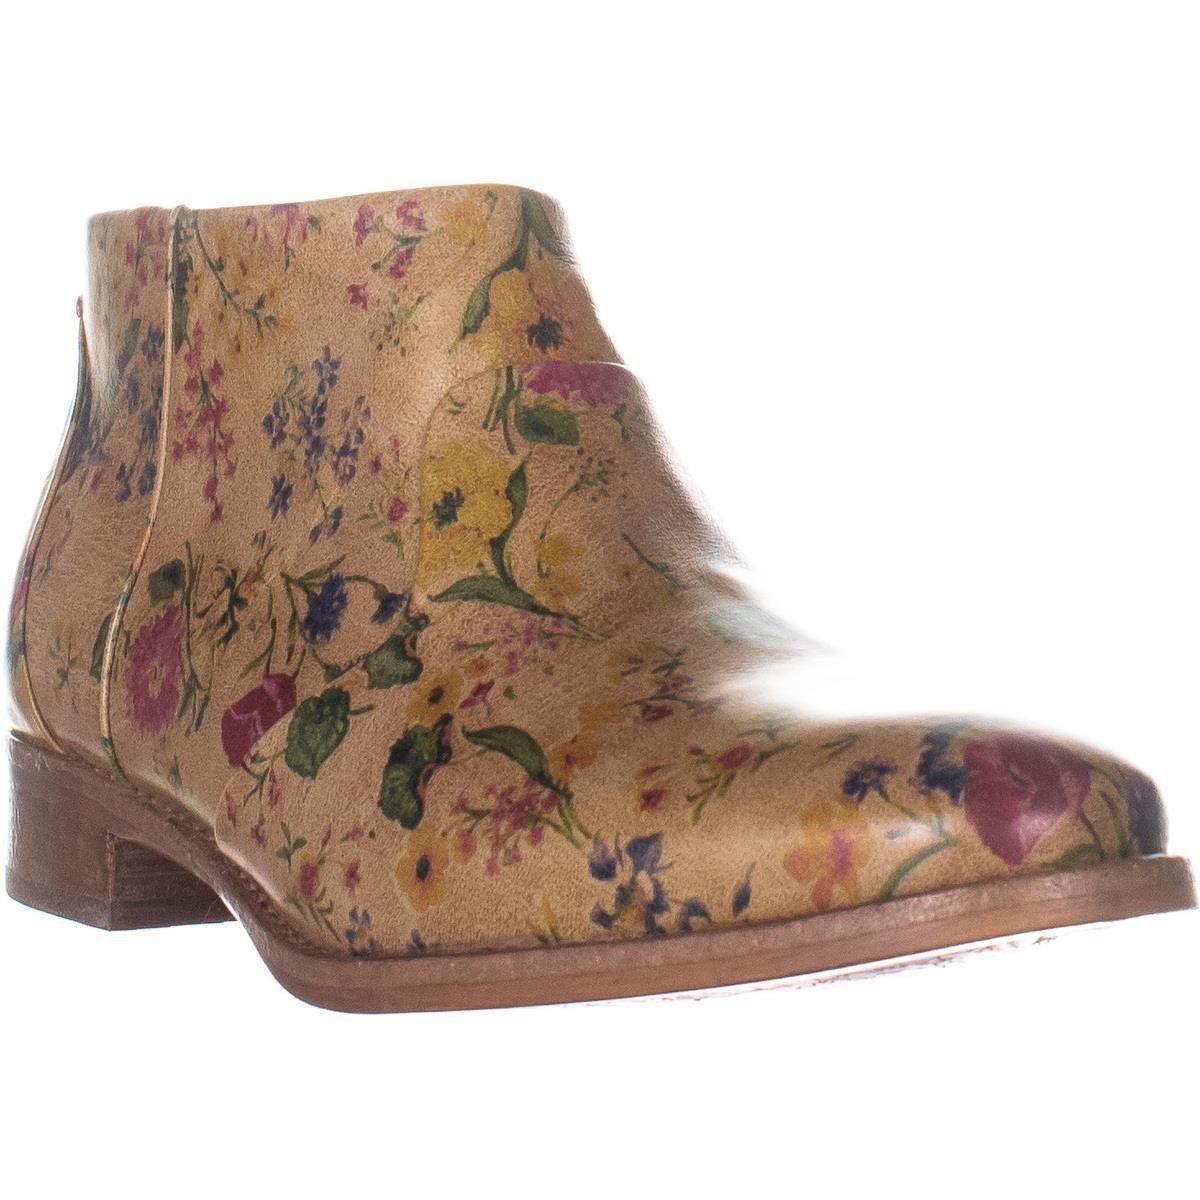 536471da2a2 Women's Brown Patrica Nash Carla Side Zip Ankle Boots